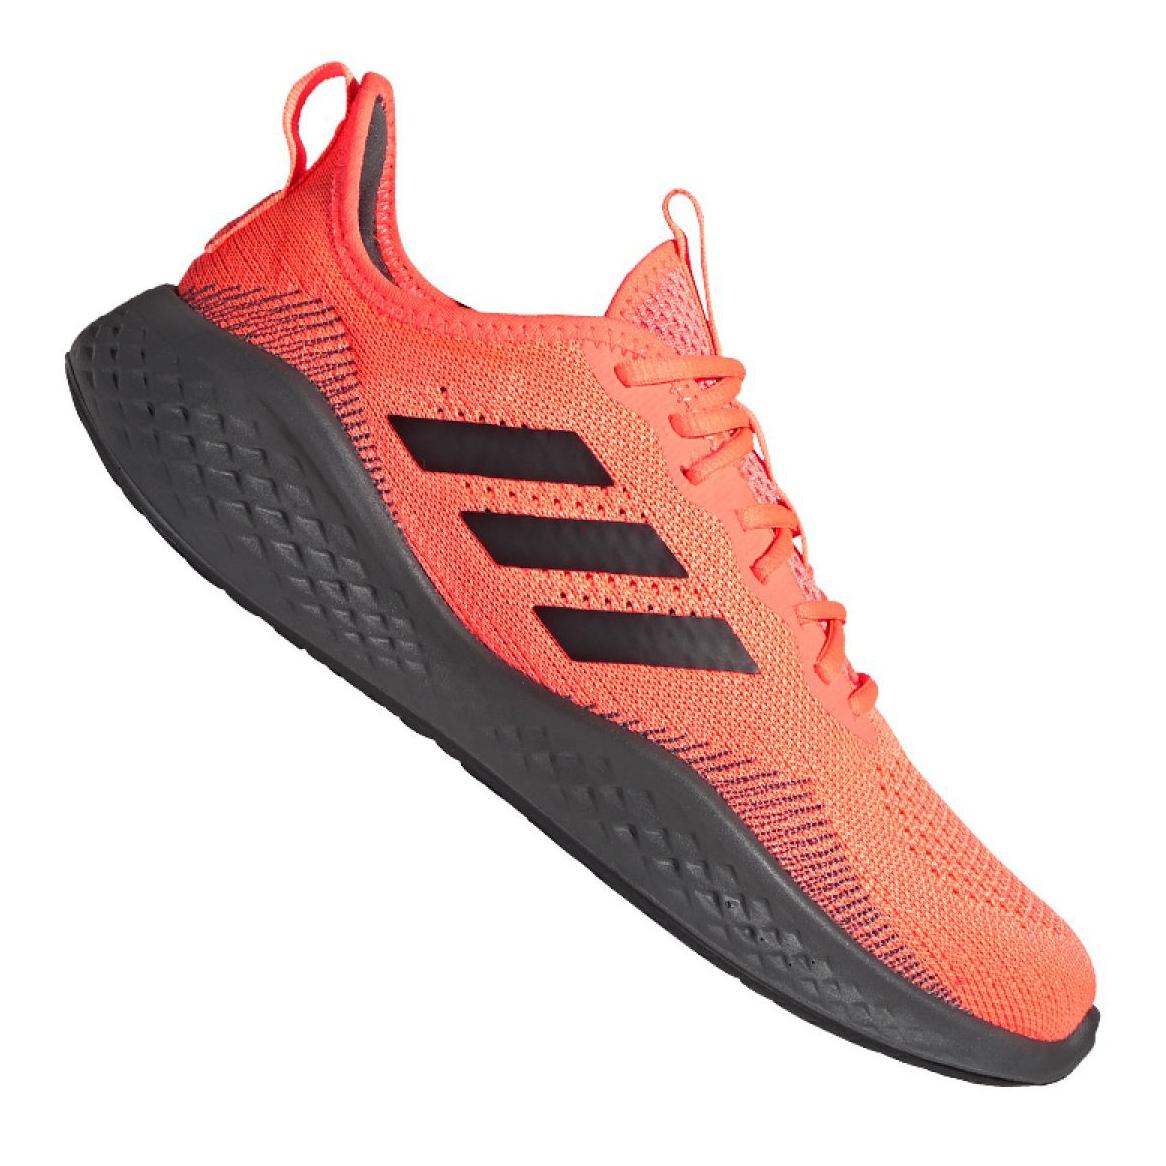 Adidas Fluidflow M EG3664 running shoes black orange